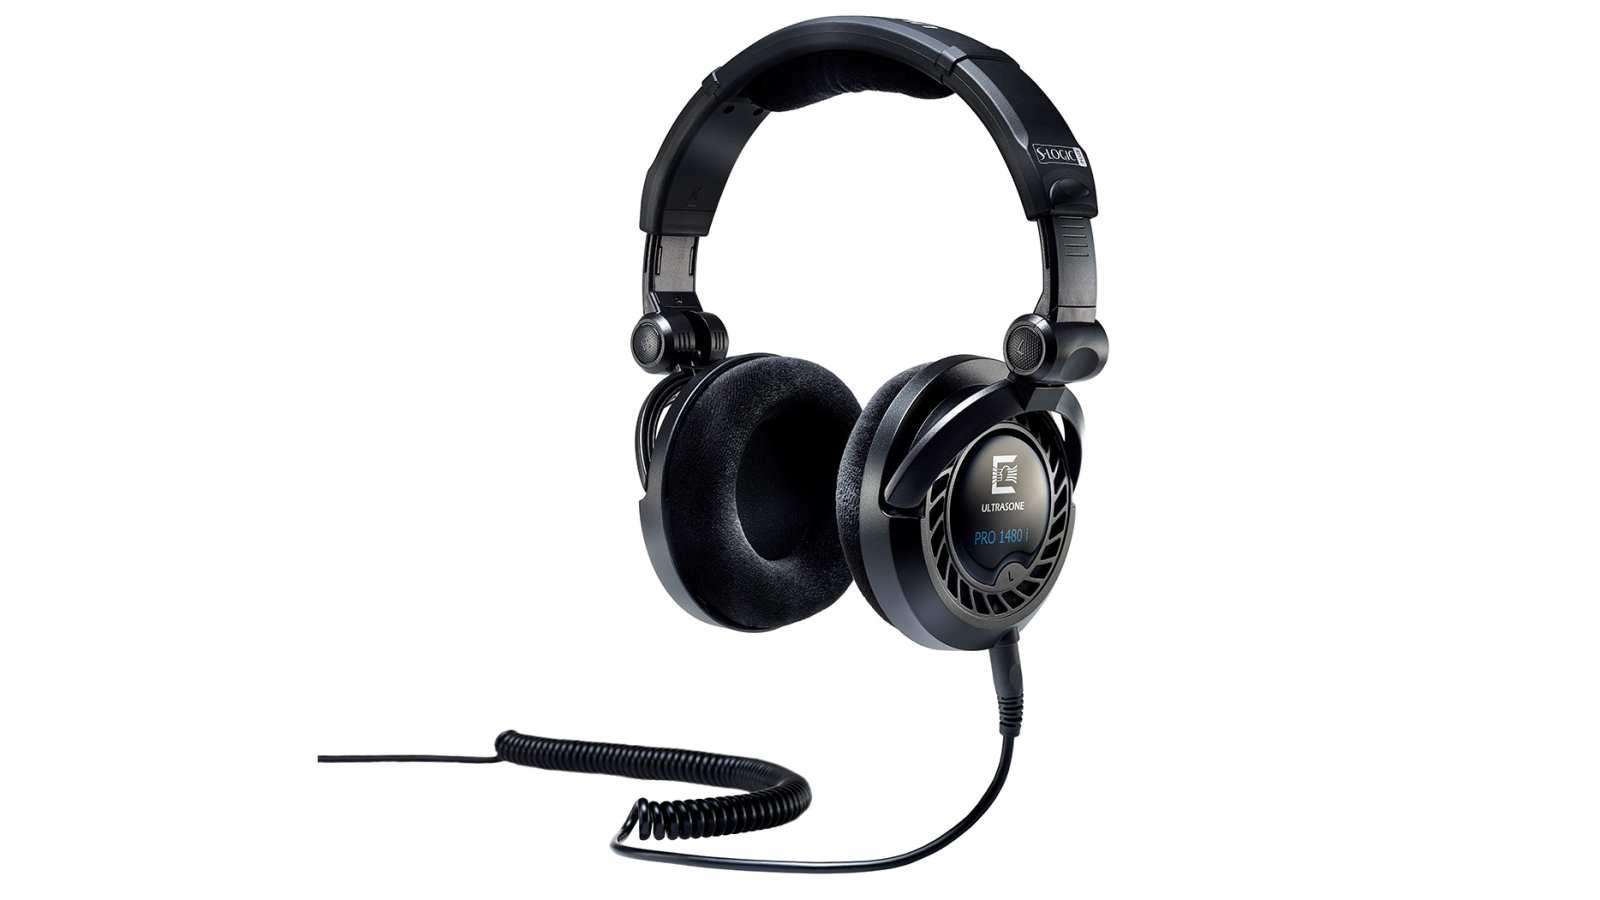 Ultrasone PRO-1480i offener Studio-Kopfhörer